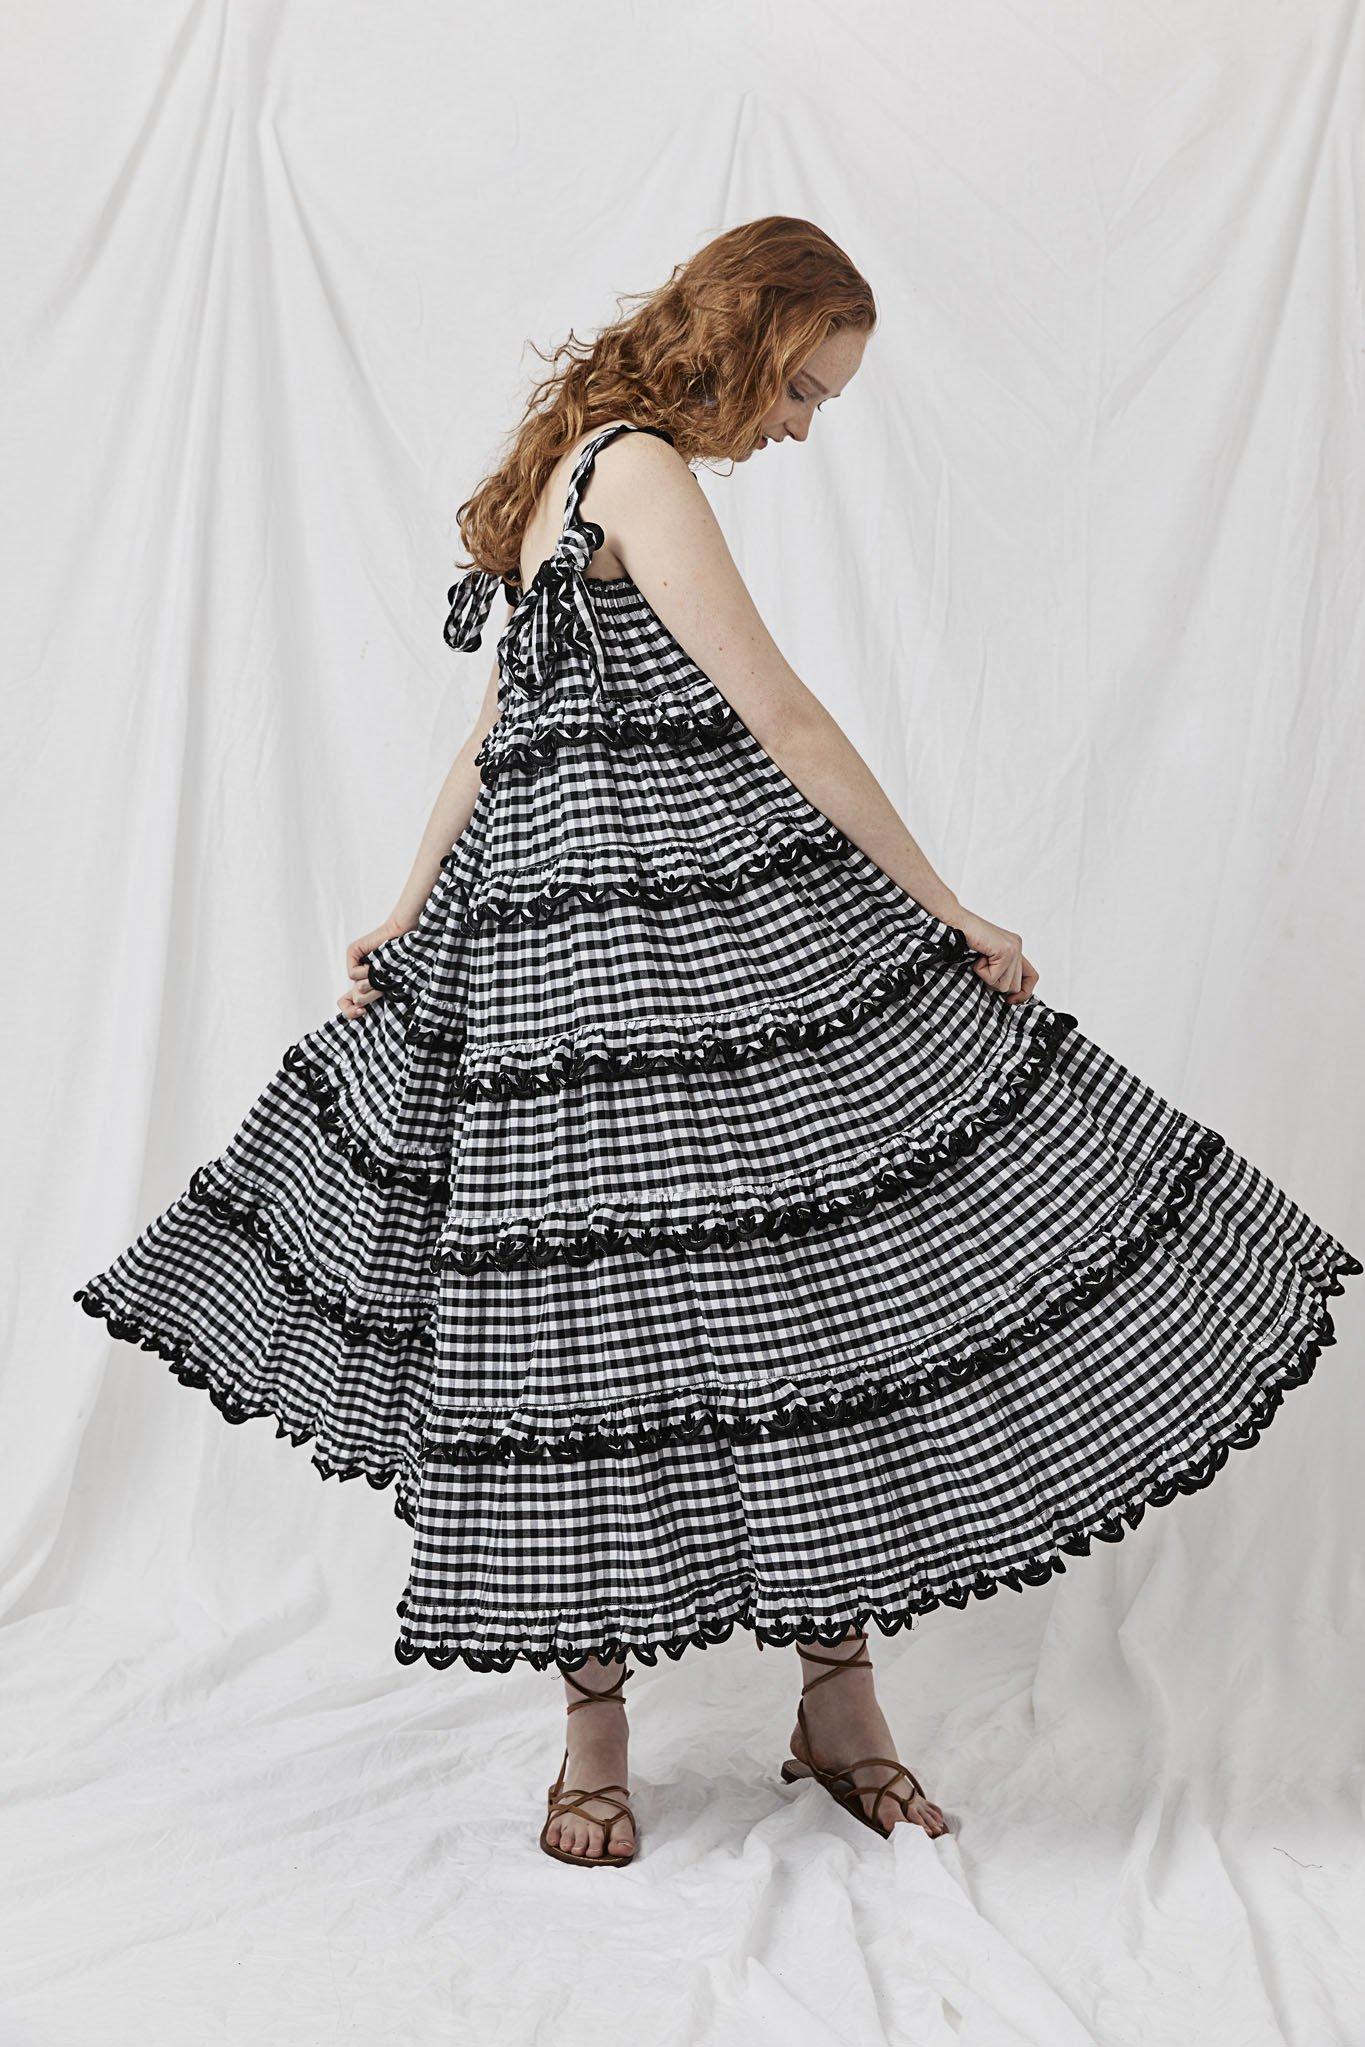 Scallop Frill Dress - Iva Biigdres Black Gingham